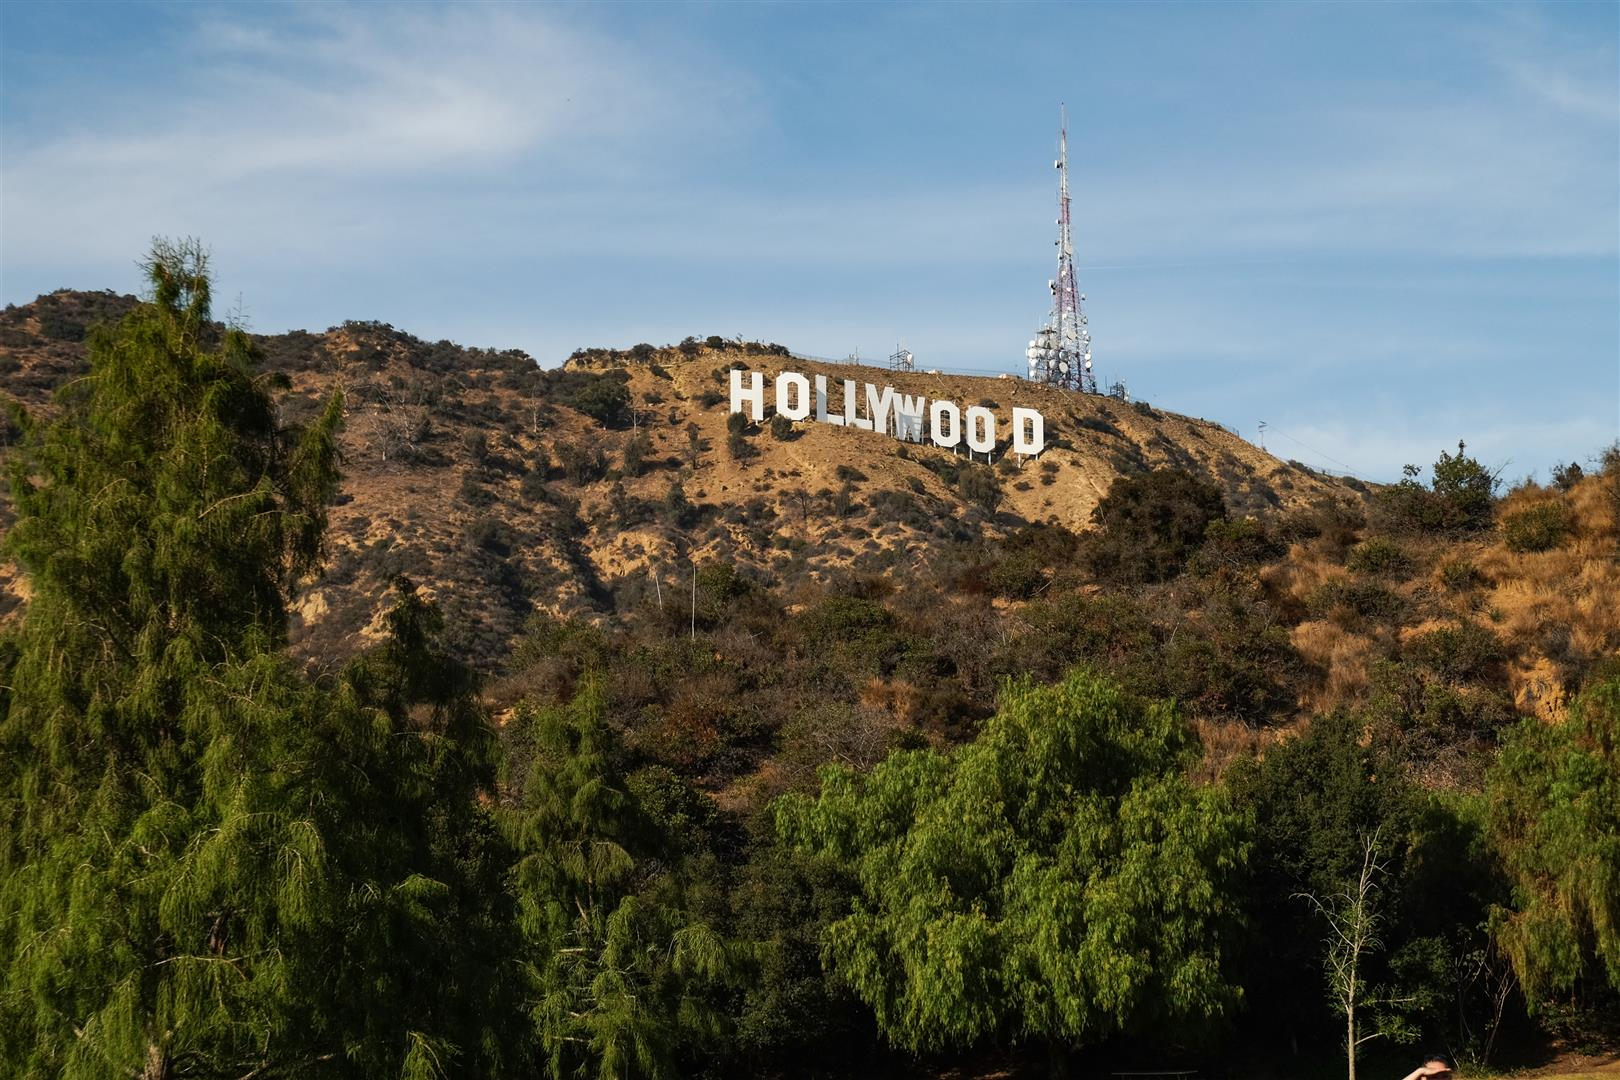 Hollywood Los Angeles (4)